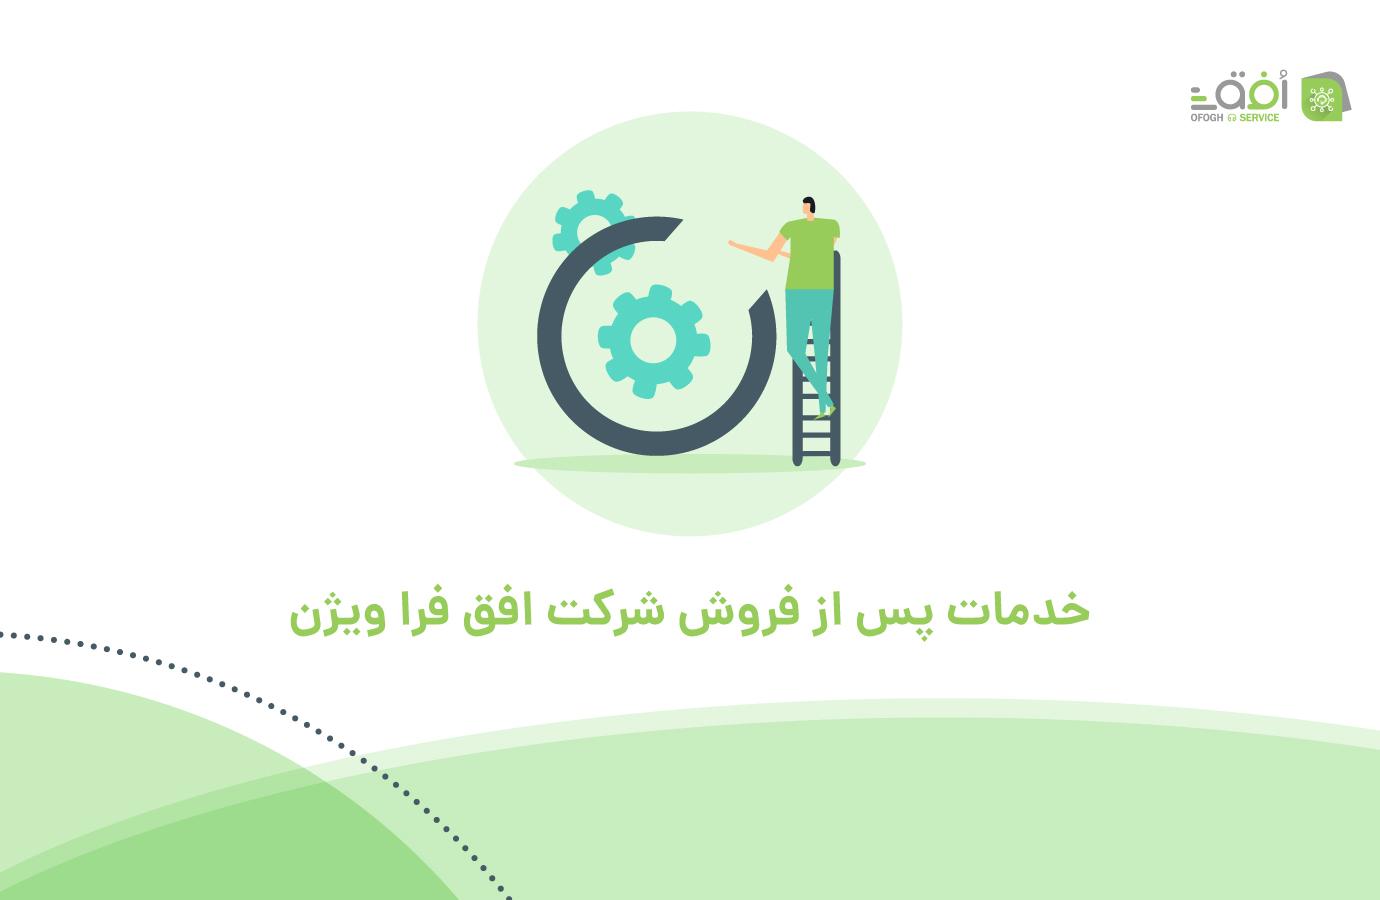 khadamat3